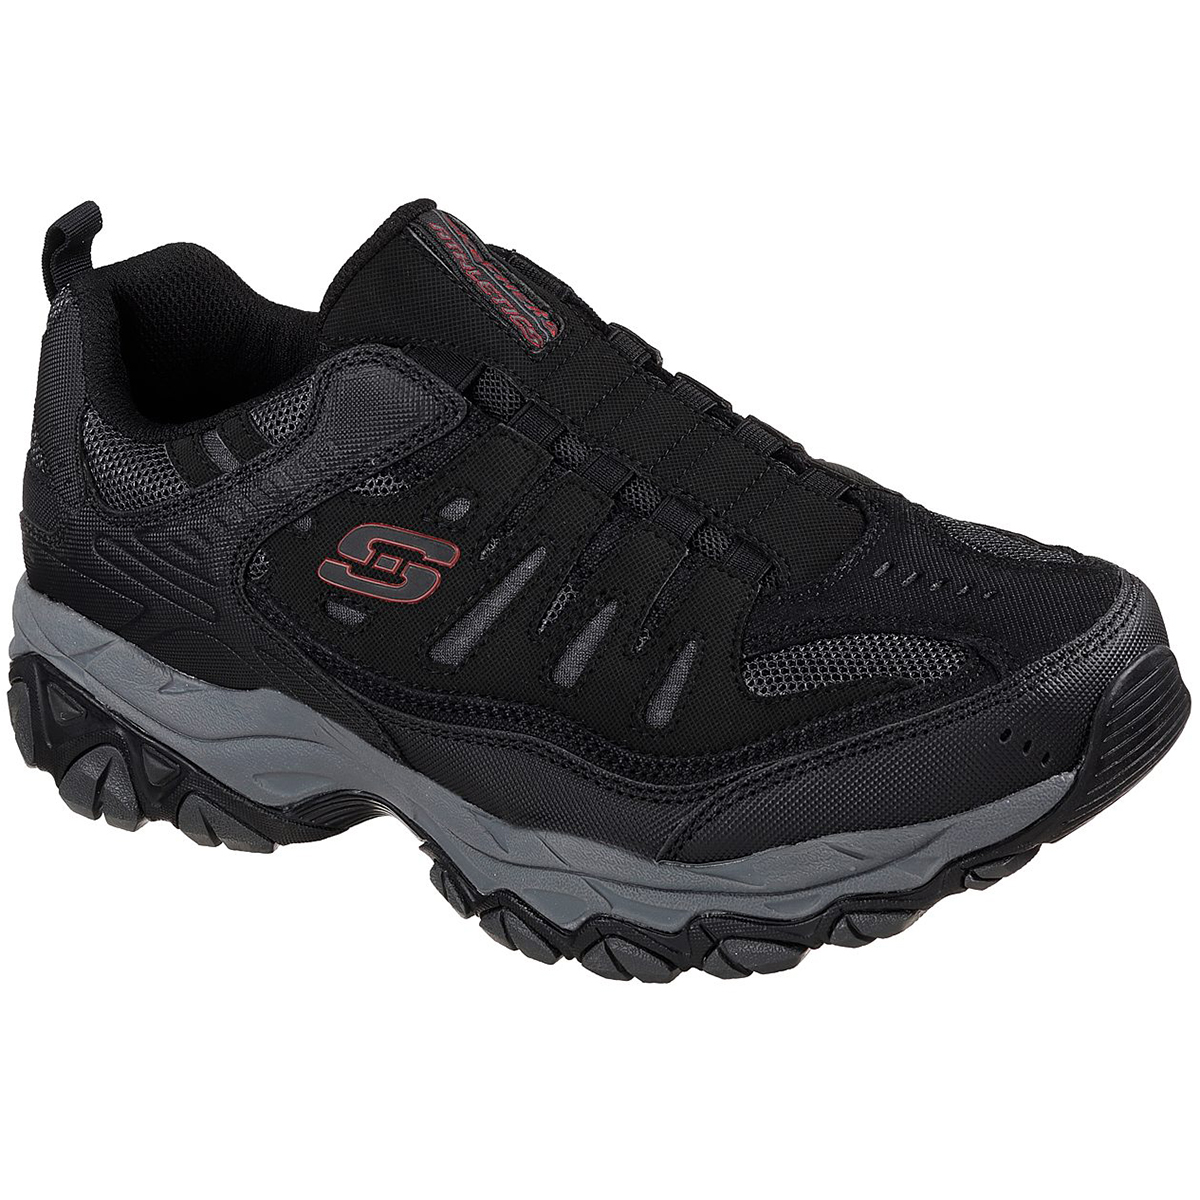 Skechers Men's After Burn-M. Fit Sneakers, Wide - Black, 9.5